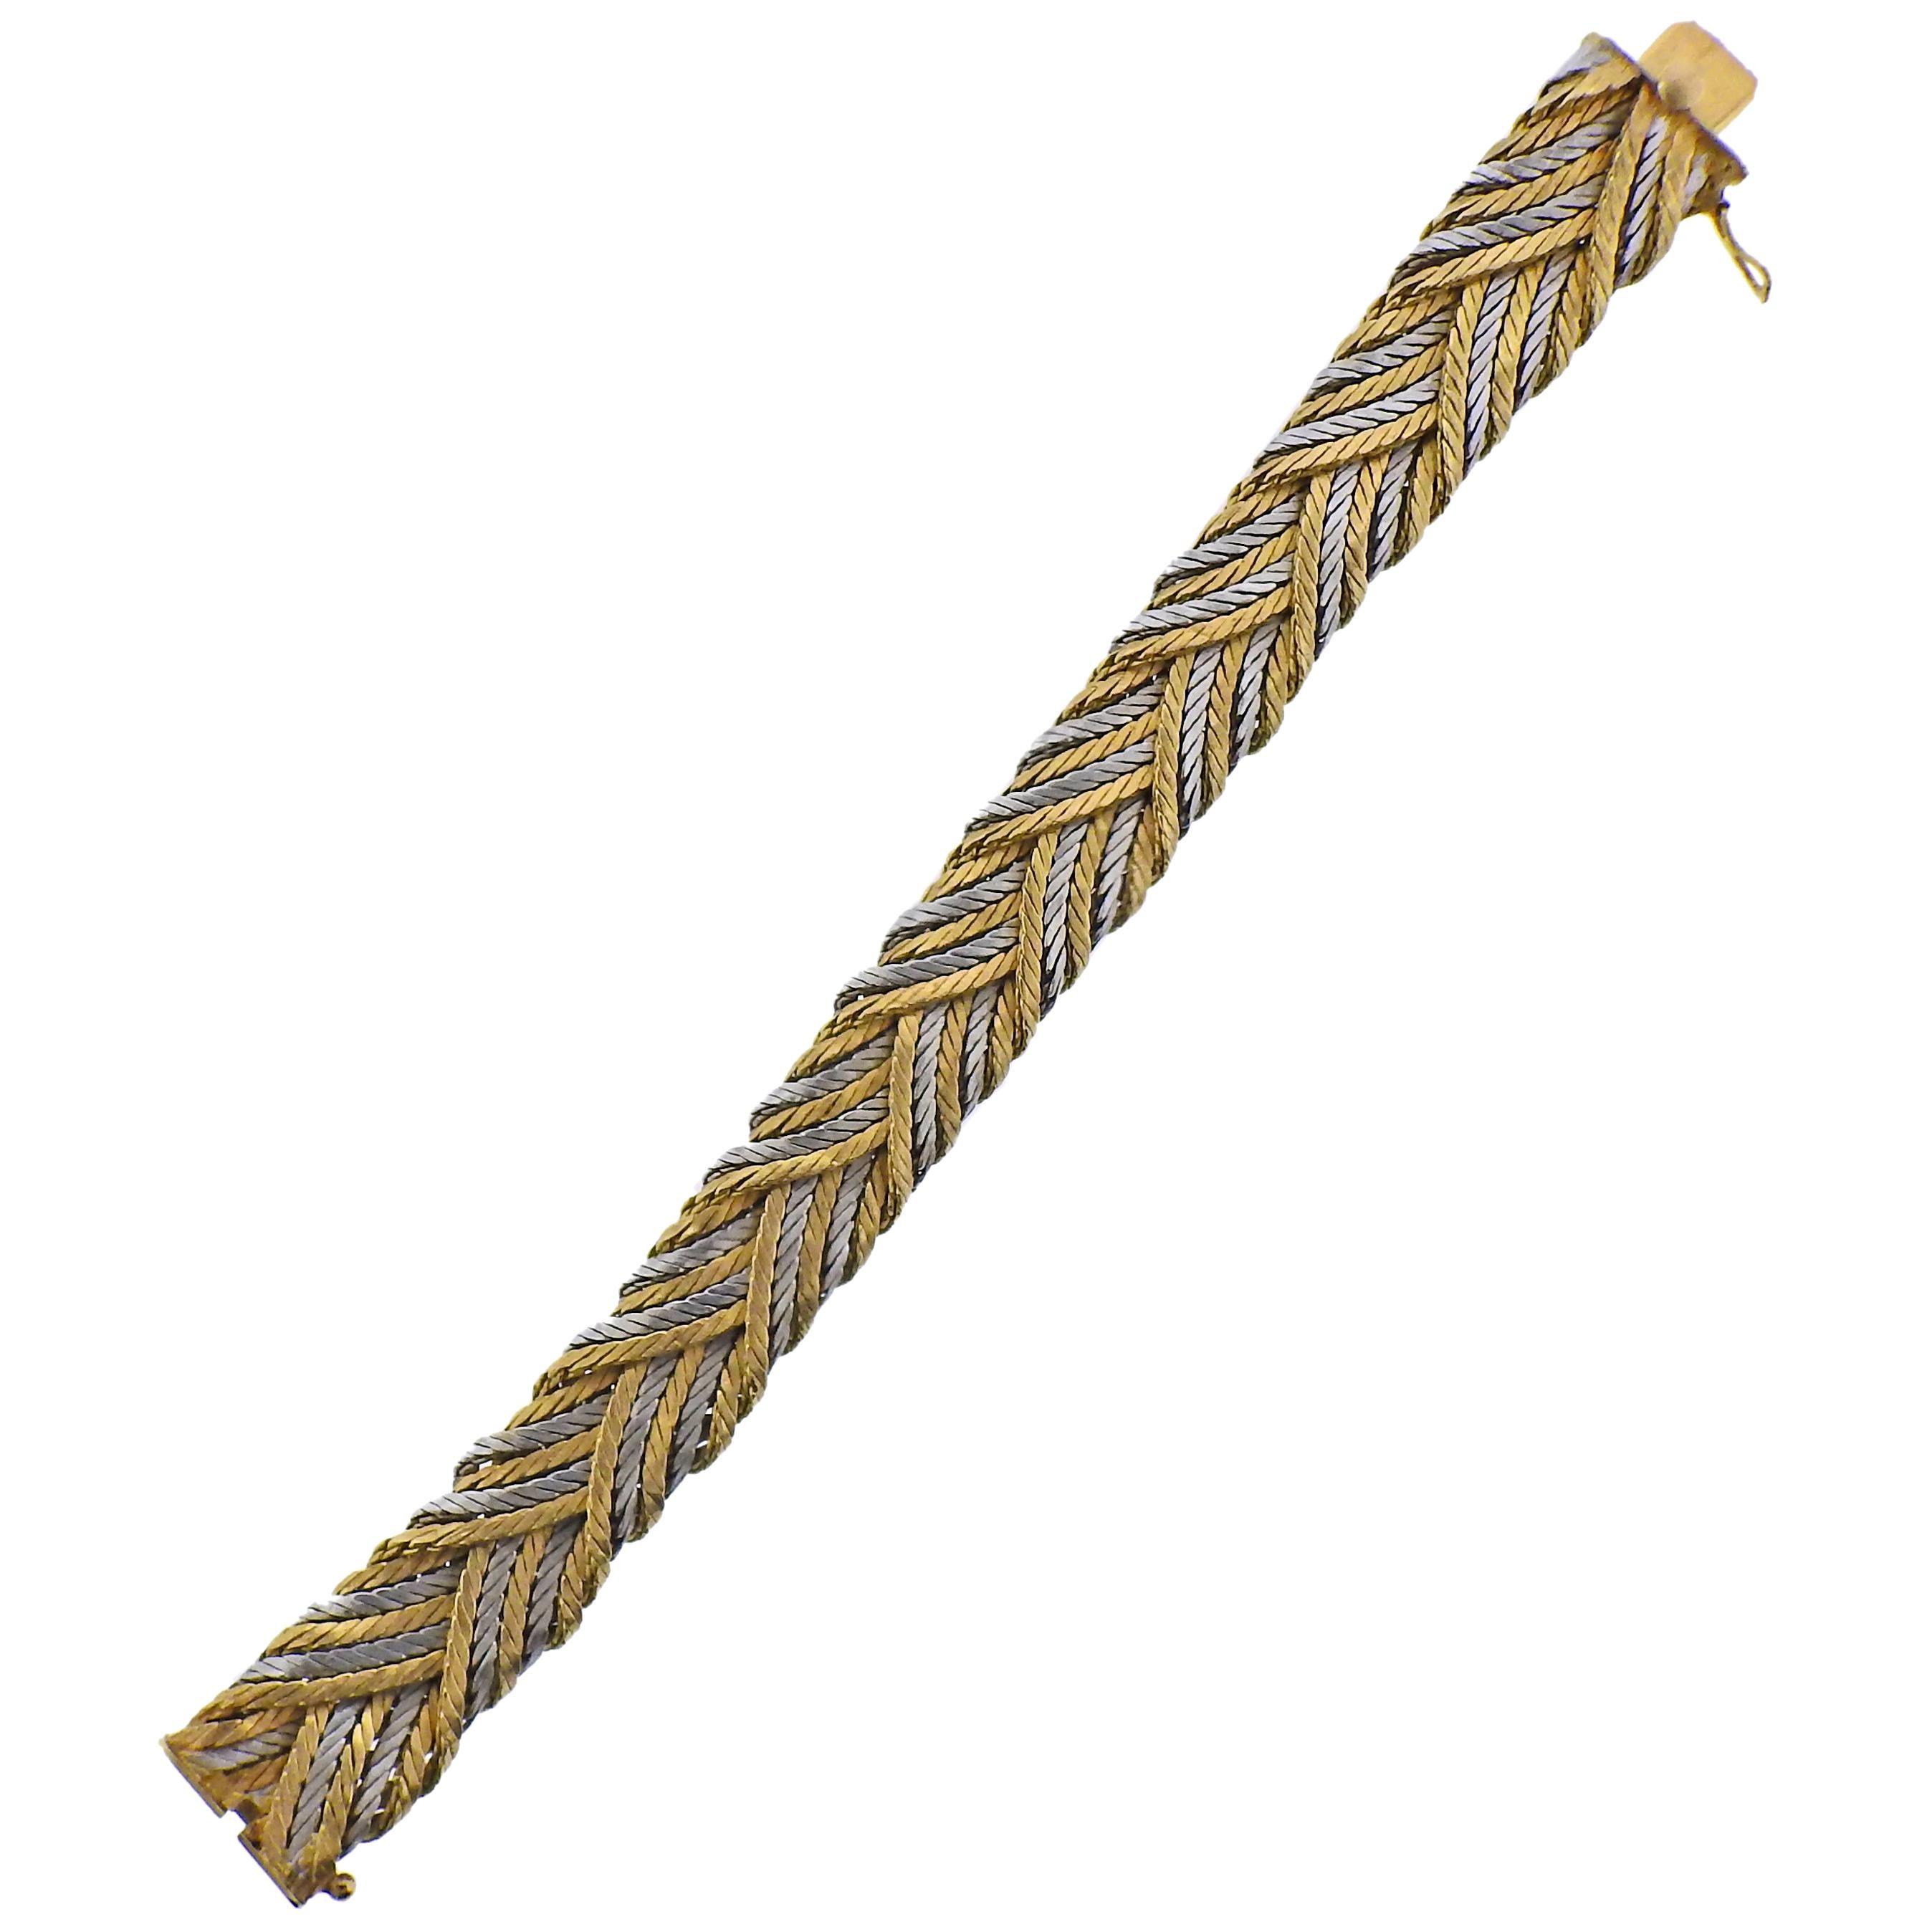 Tiffany & Co 1960s 18 Karat Gold Woven Bracelet